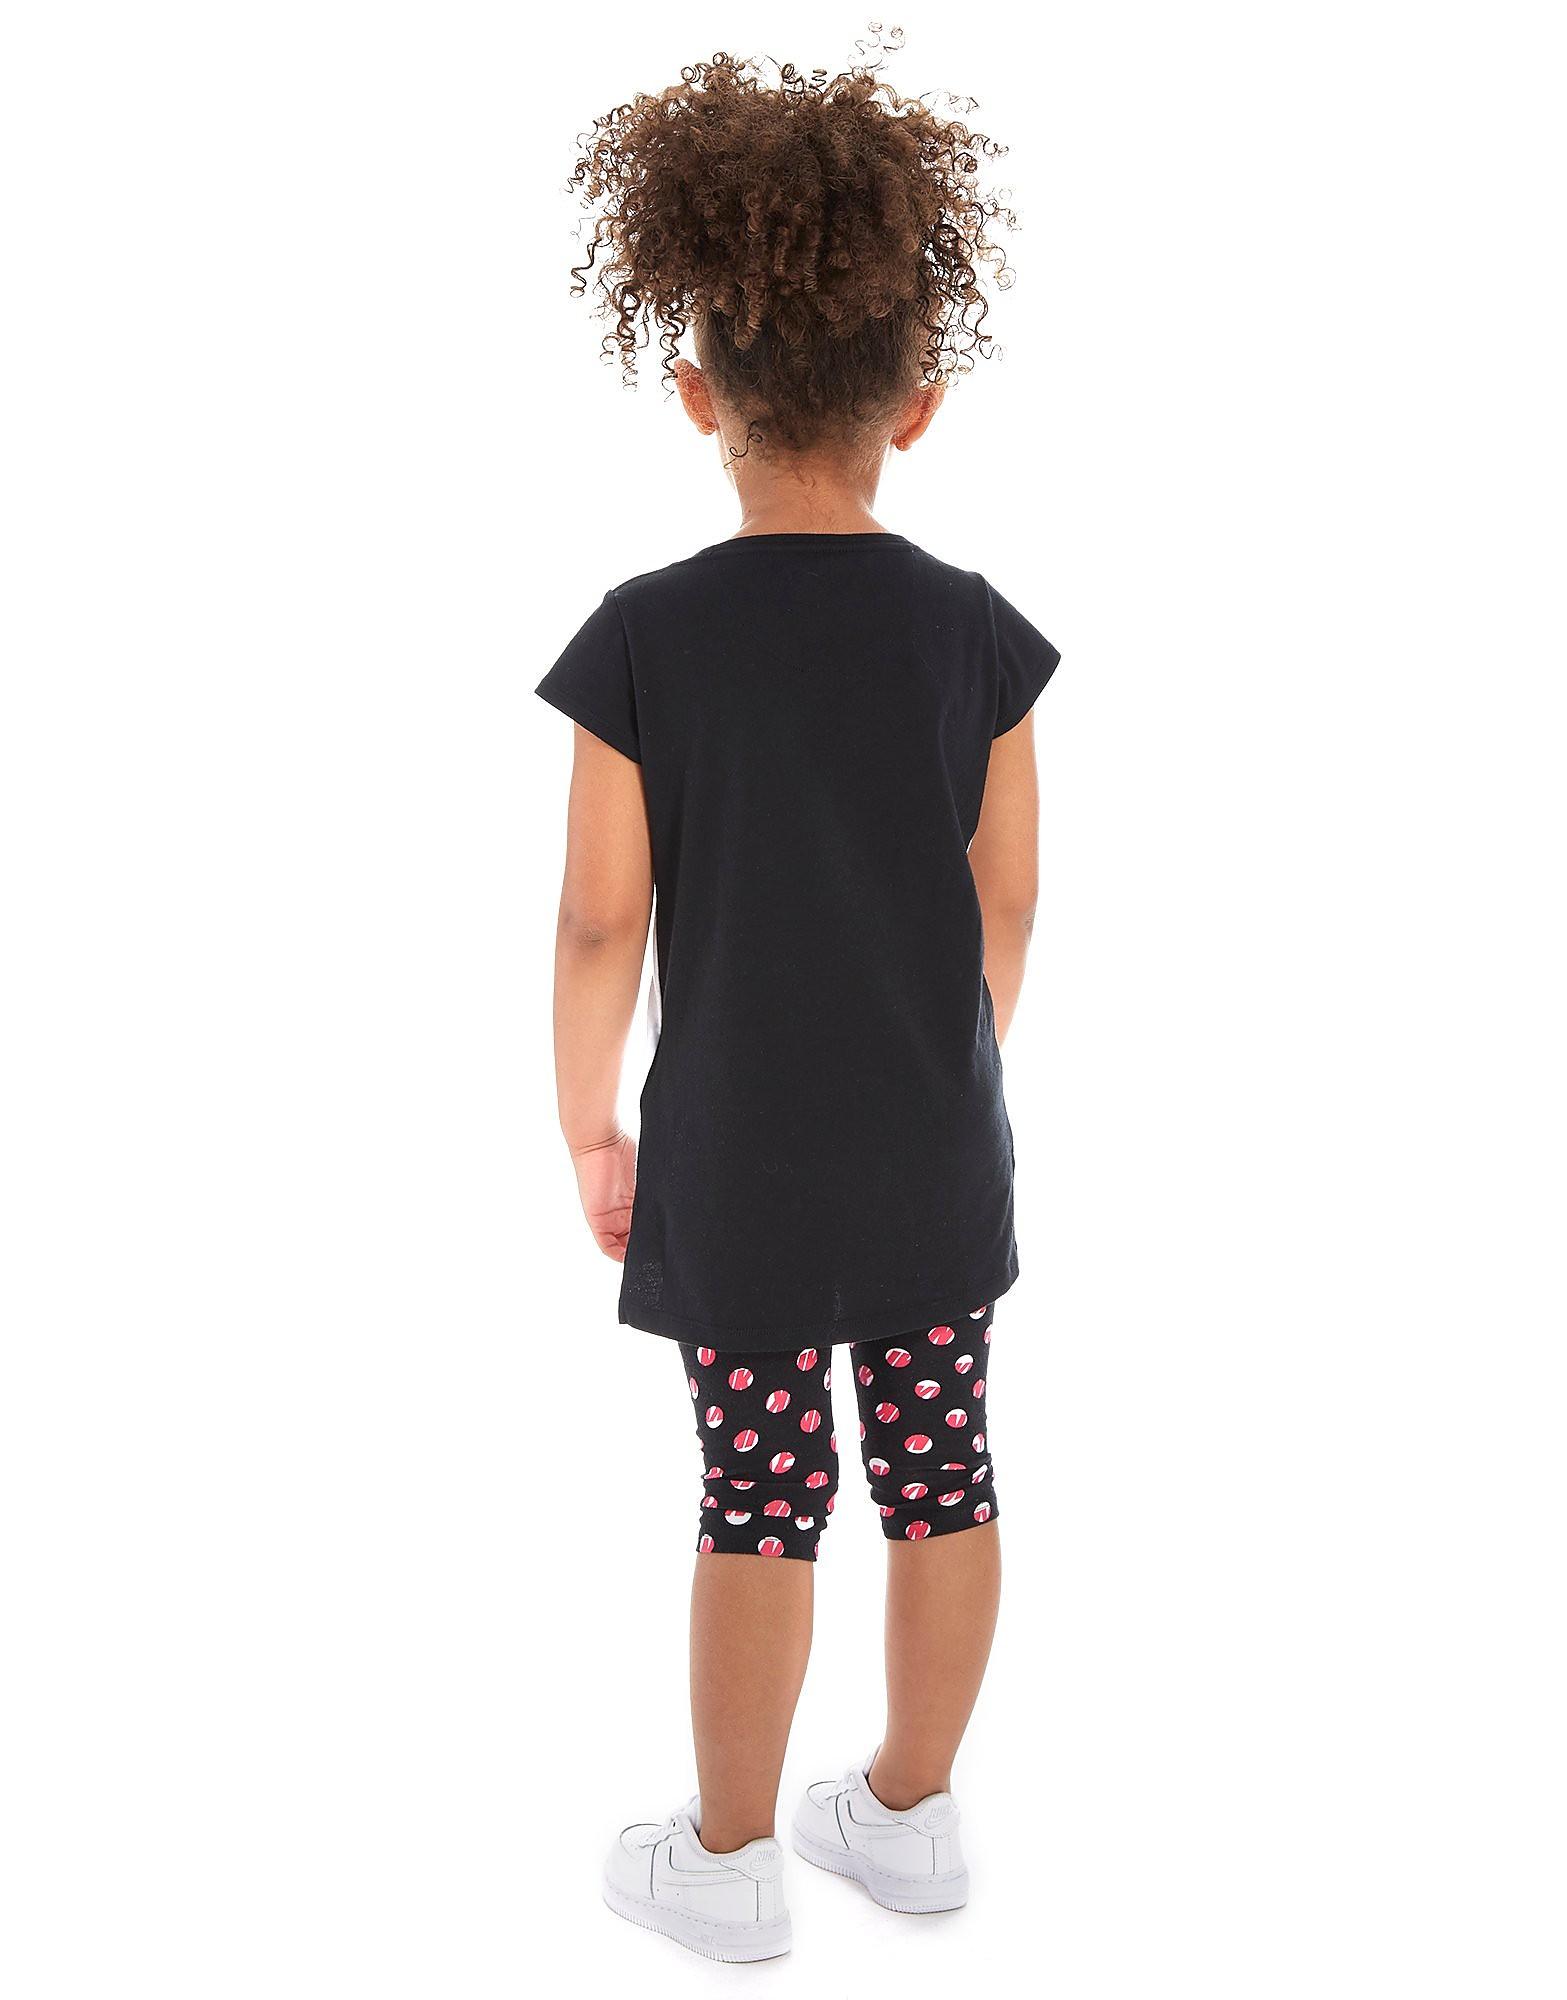 Nike Girls' T-Shirt + Capri Set Children